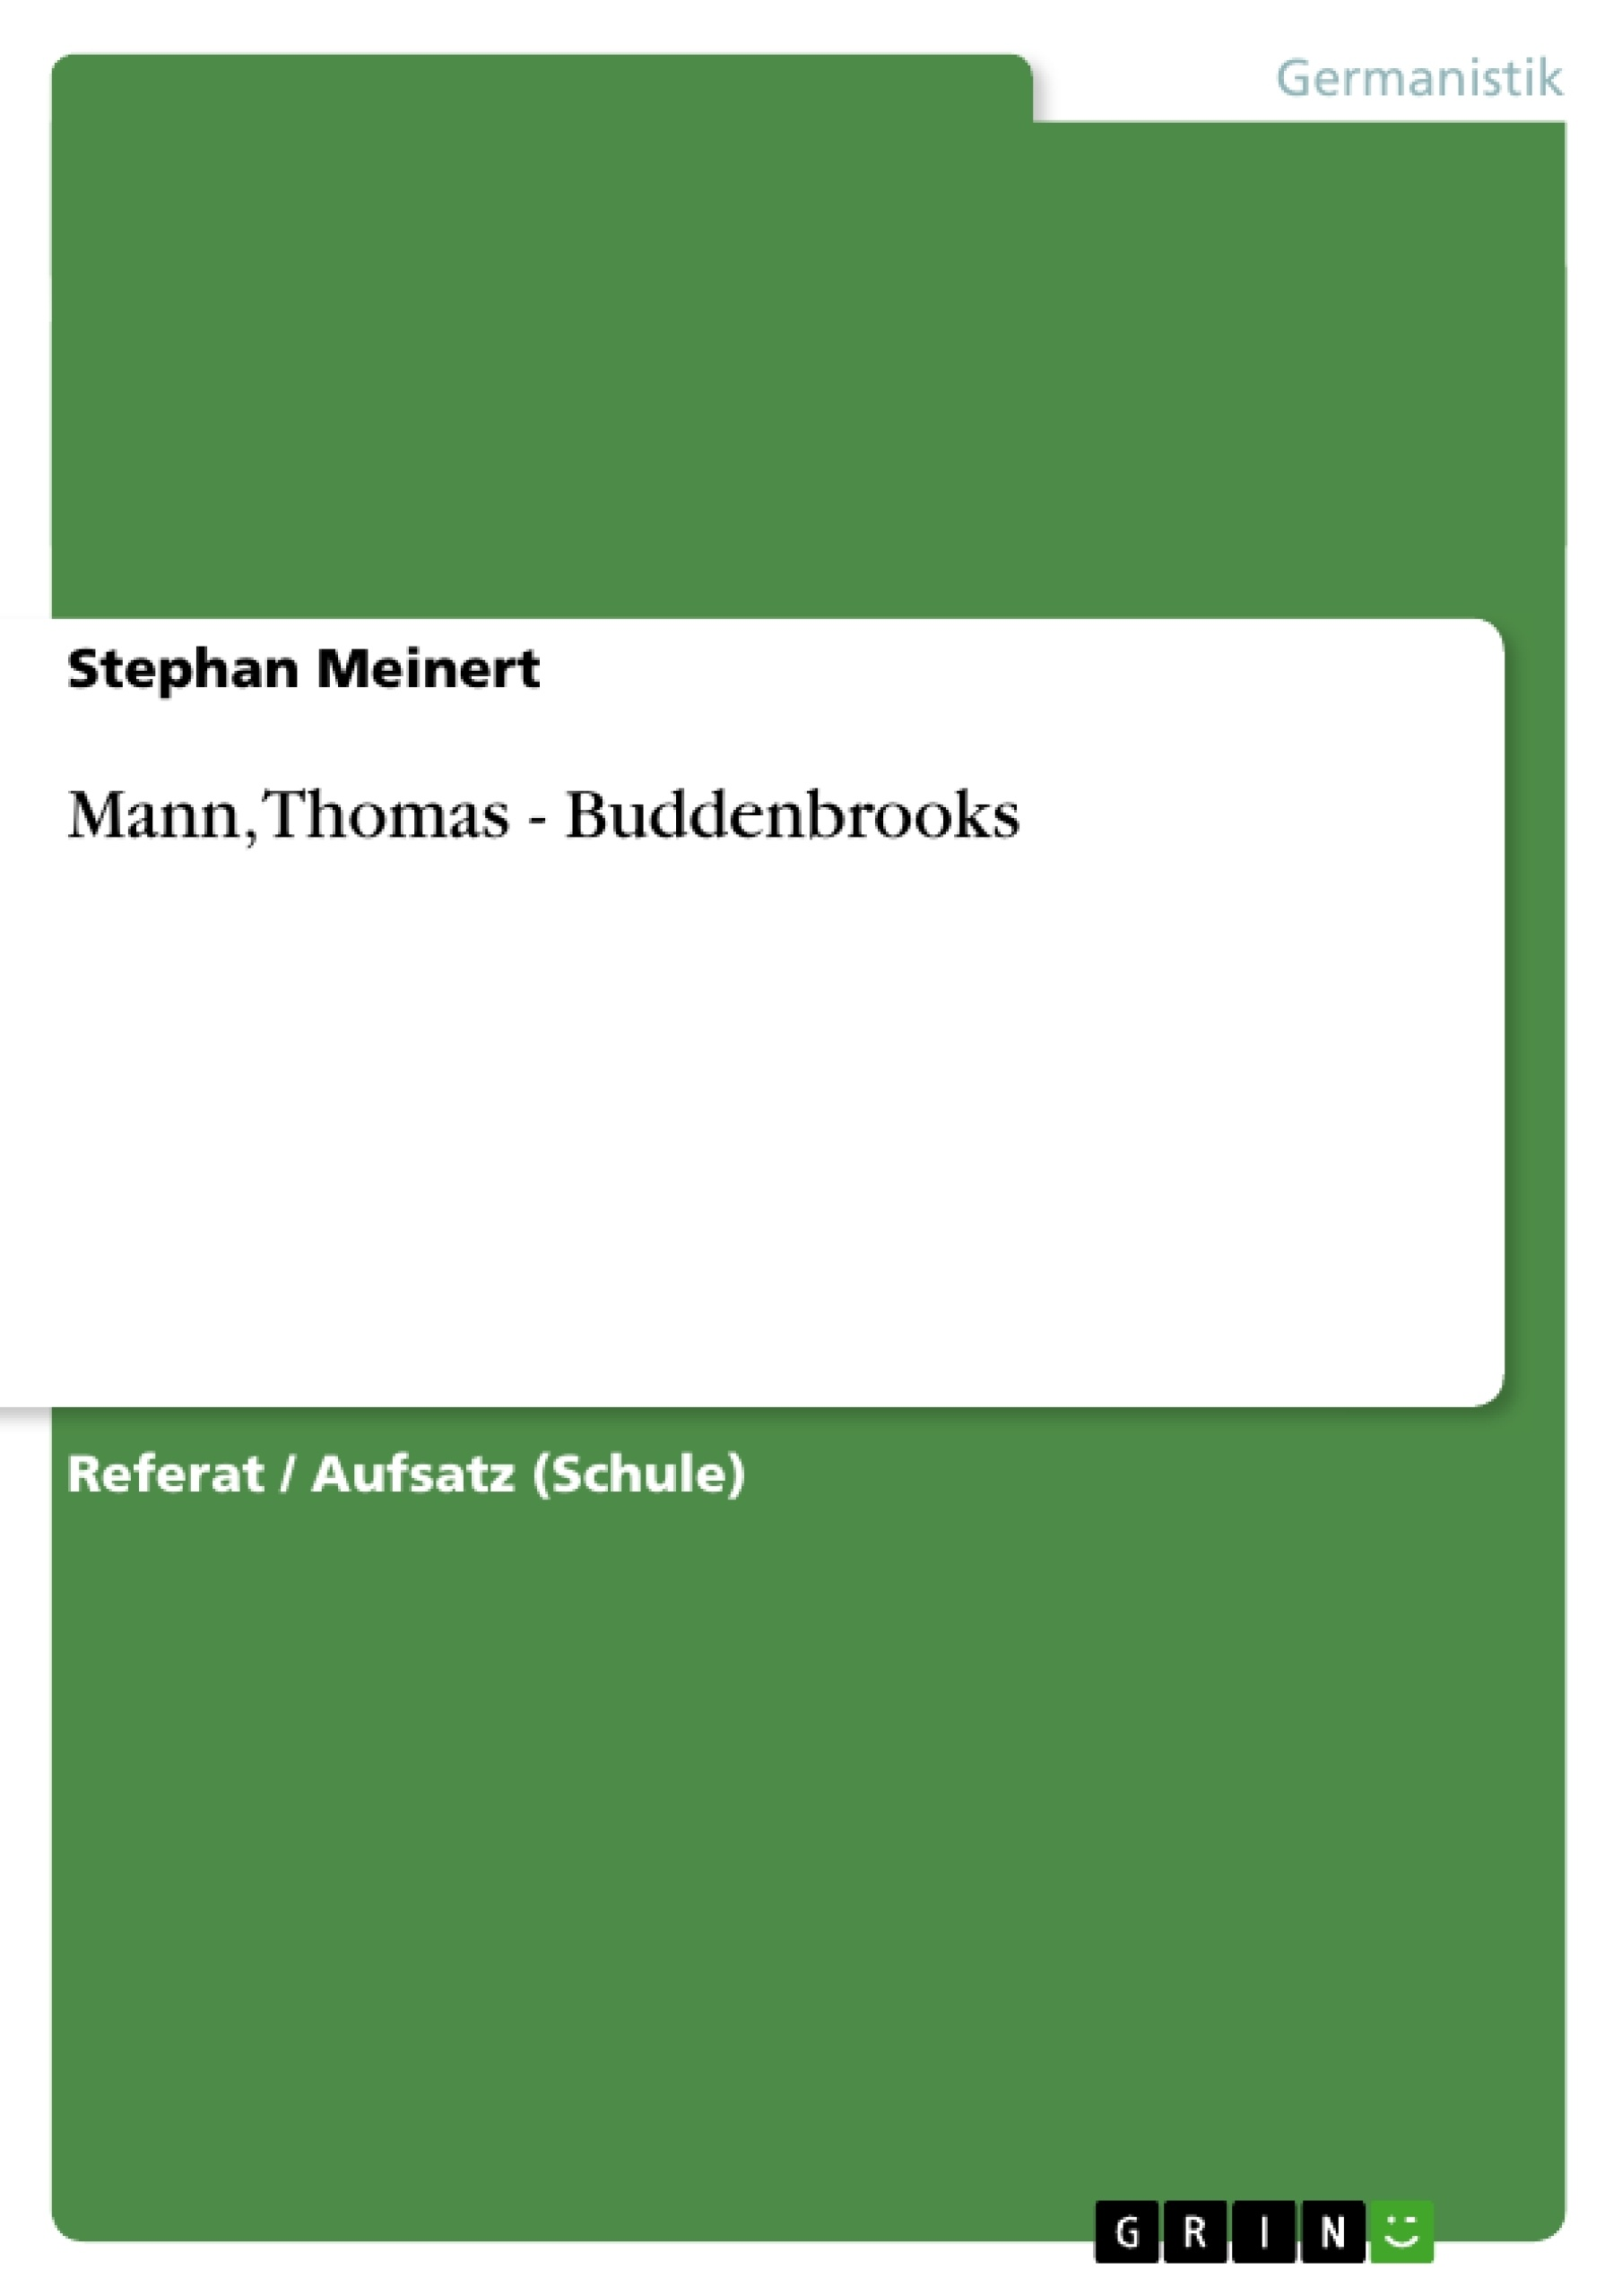 Titel: Mann, Thomas - Buddenbrooks